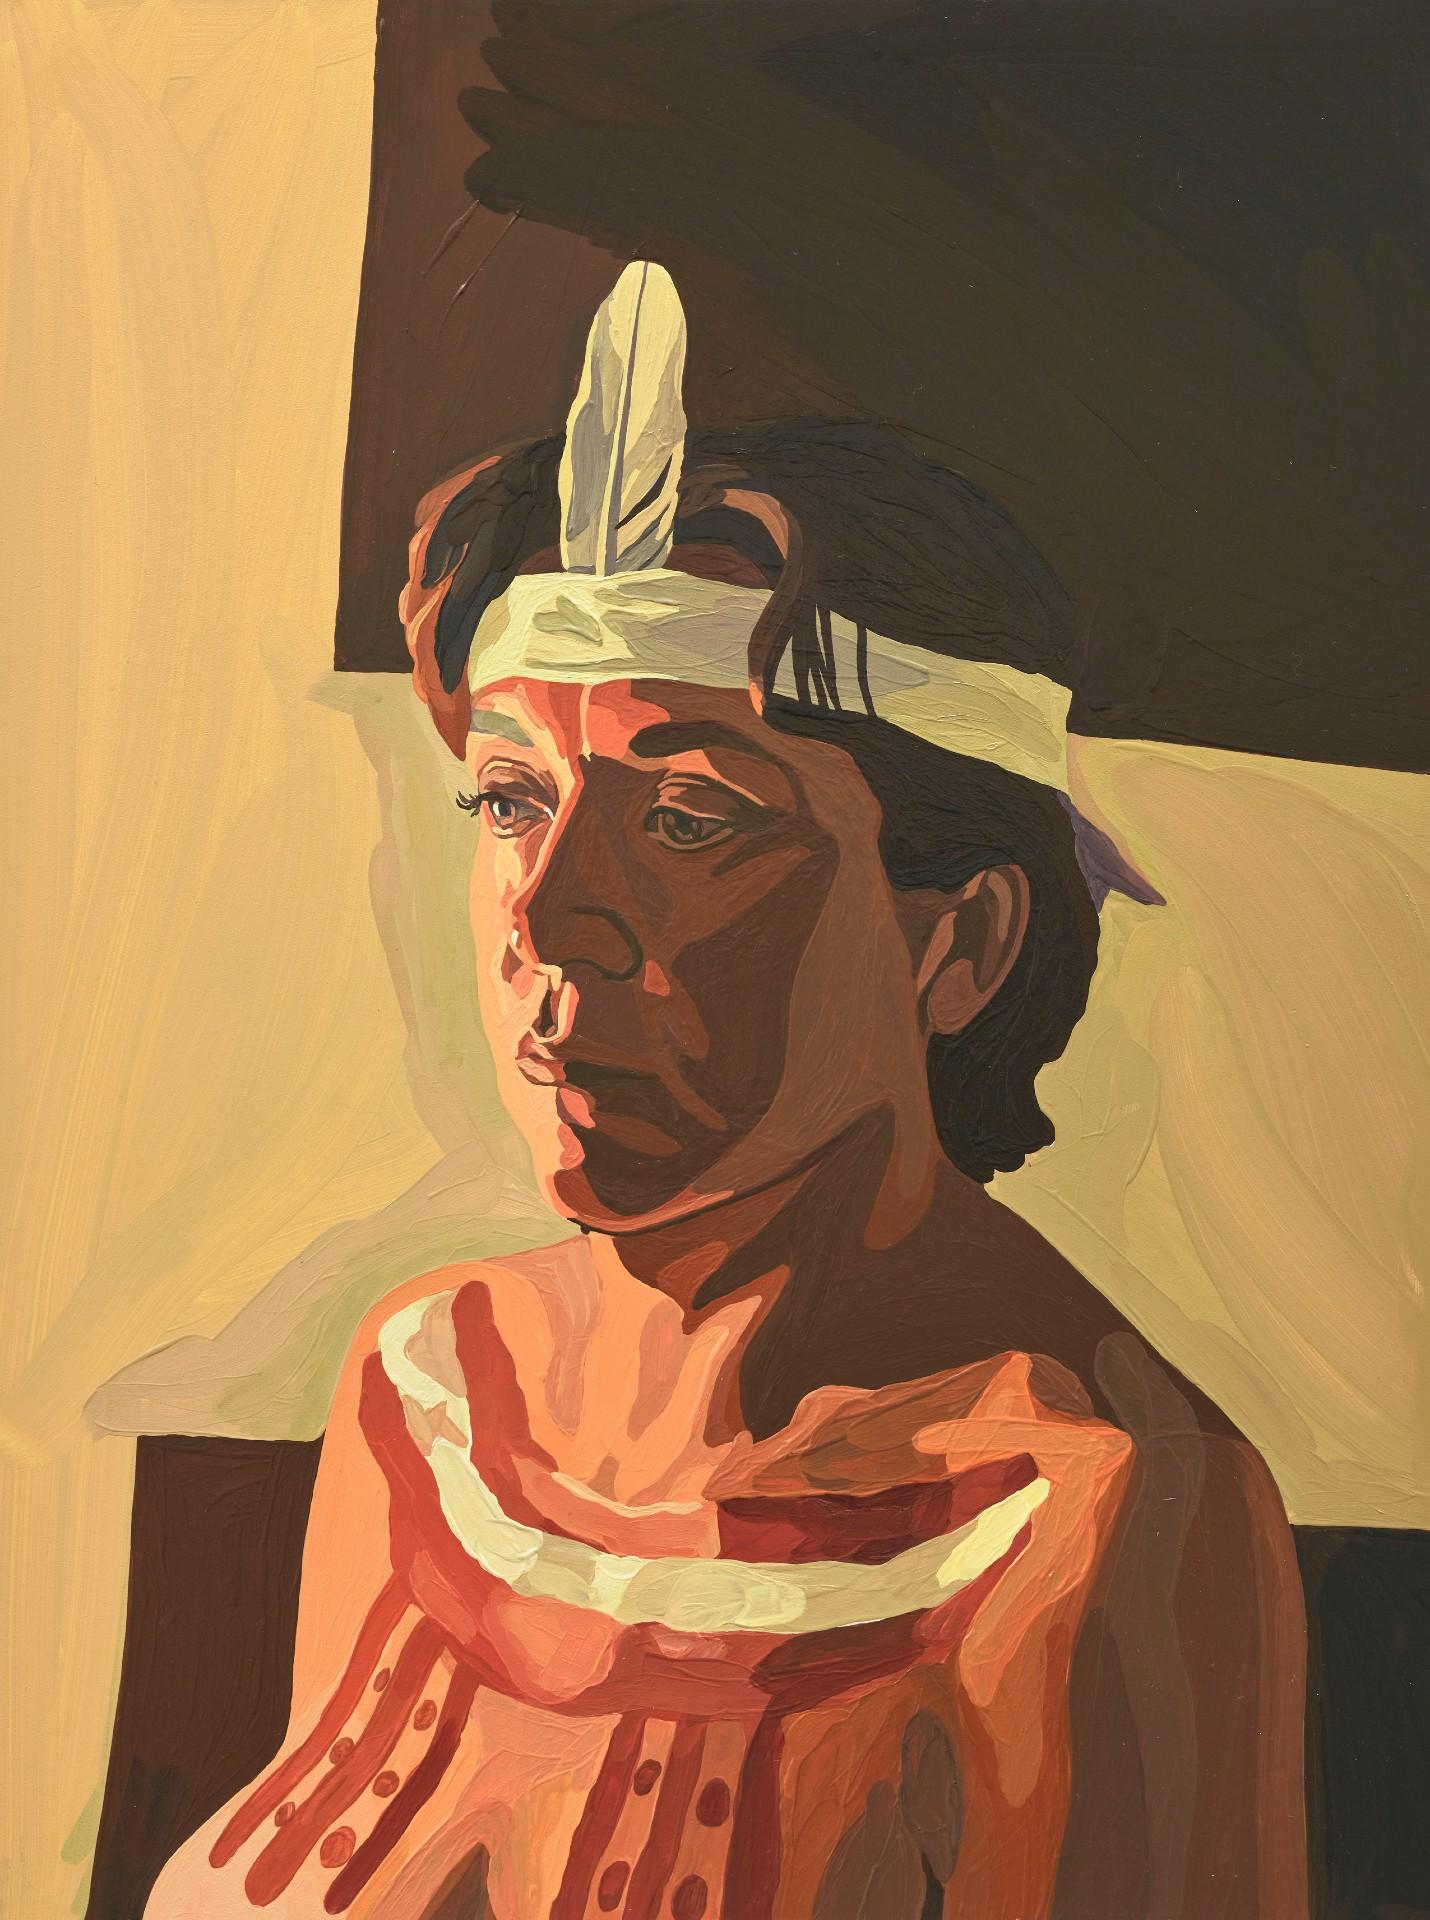 A portrait of Rachel Perkins wearing traditional p